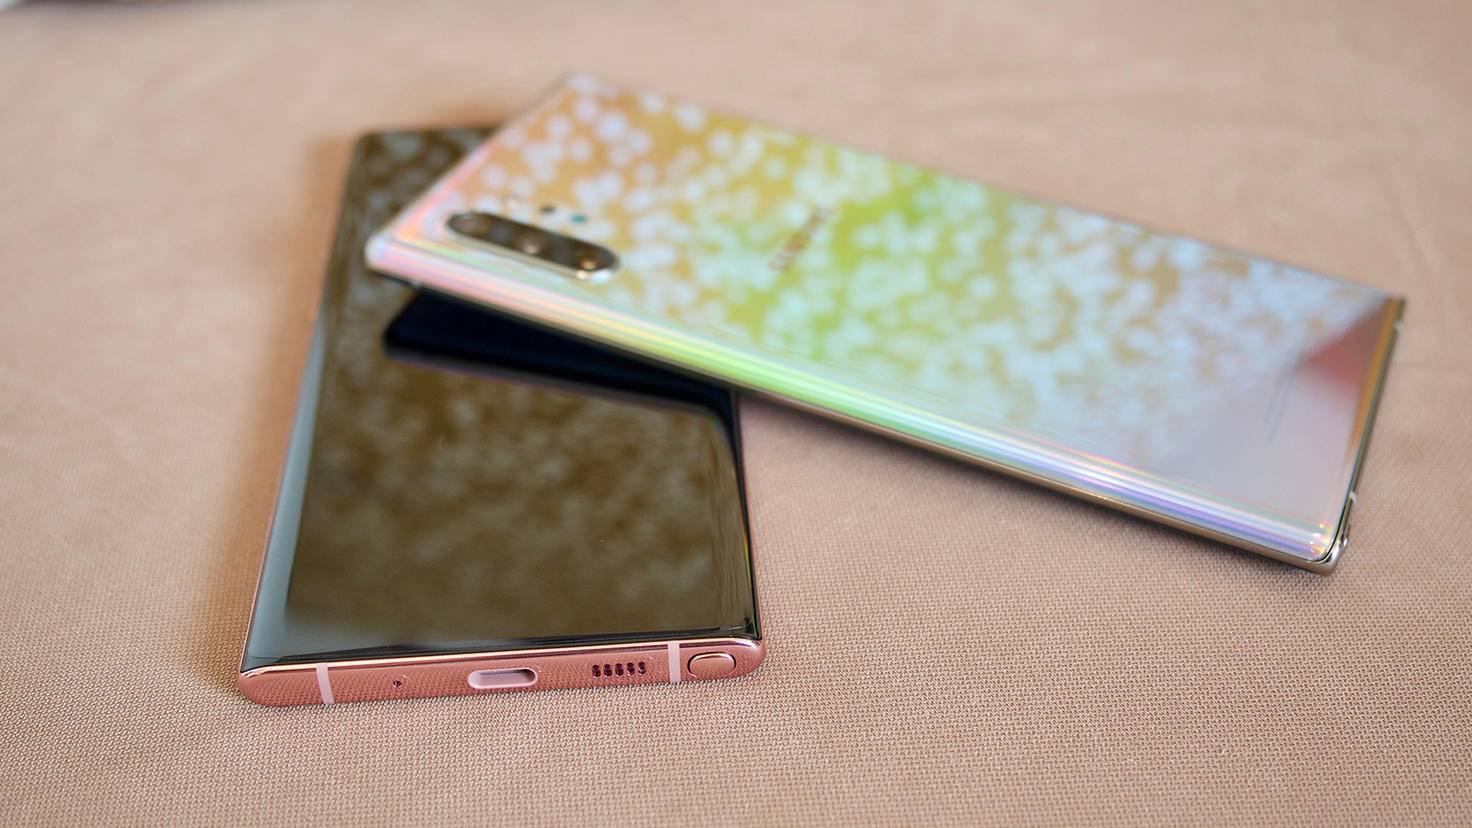 Galaxy Note 10 Plus Anschluss